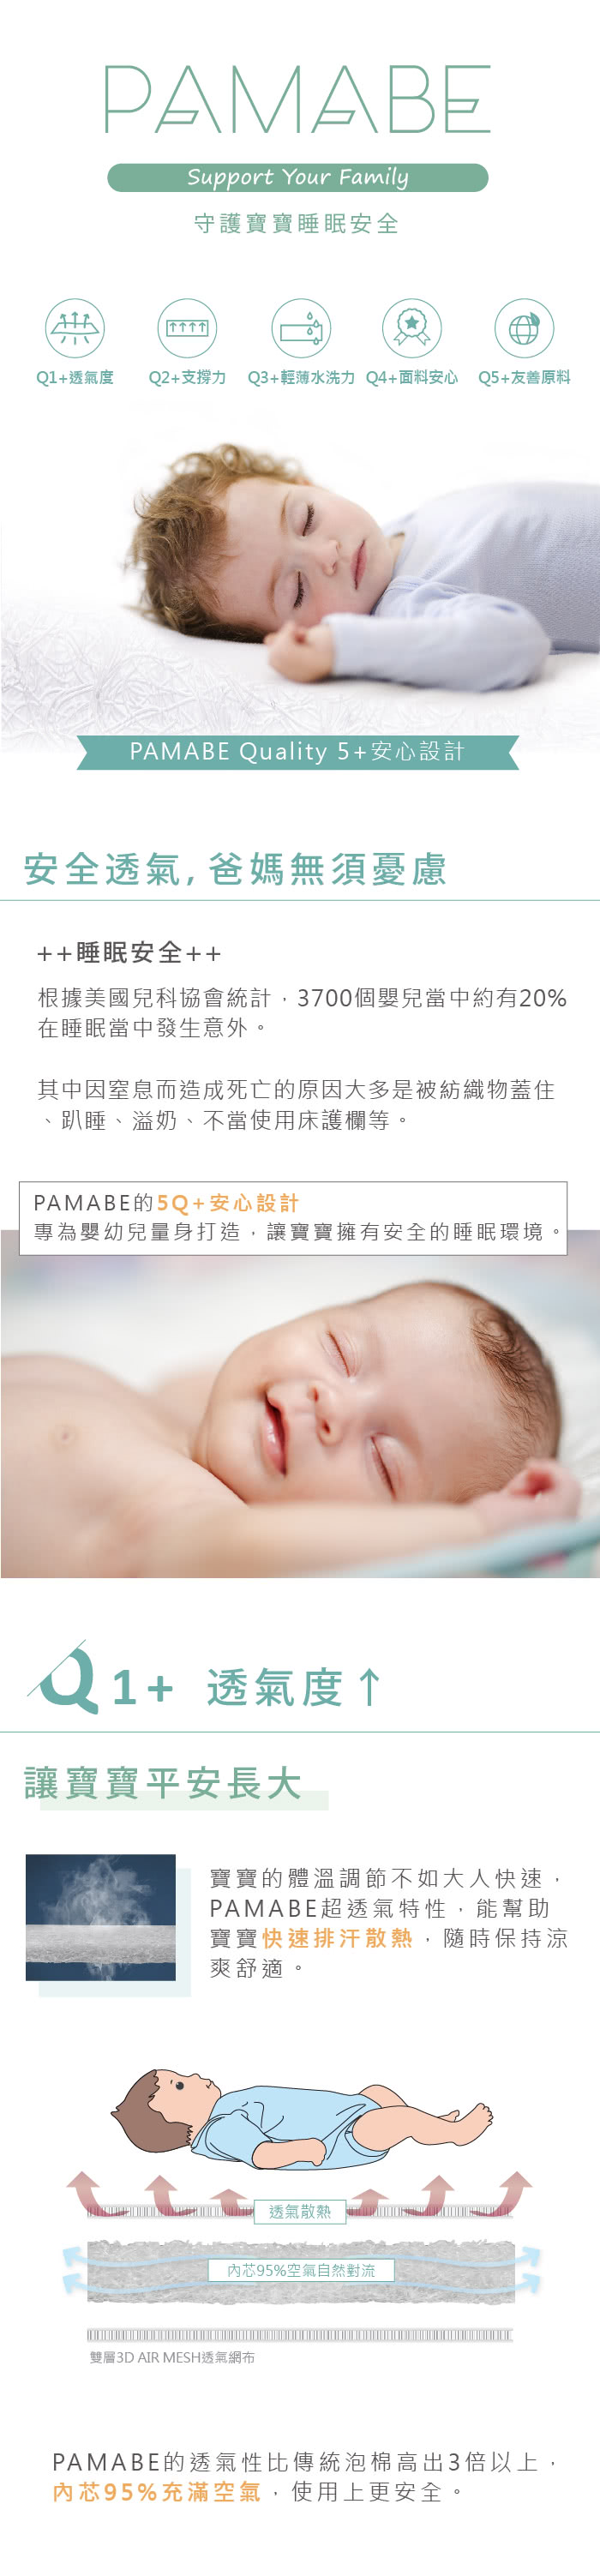 PAMABE 水洗透氣護脊嬰兒床墊